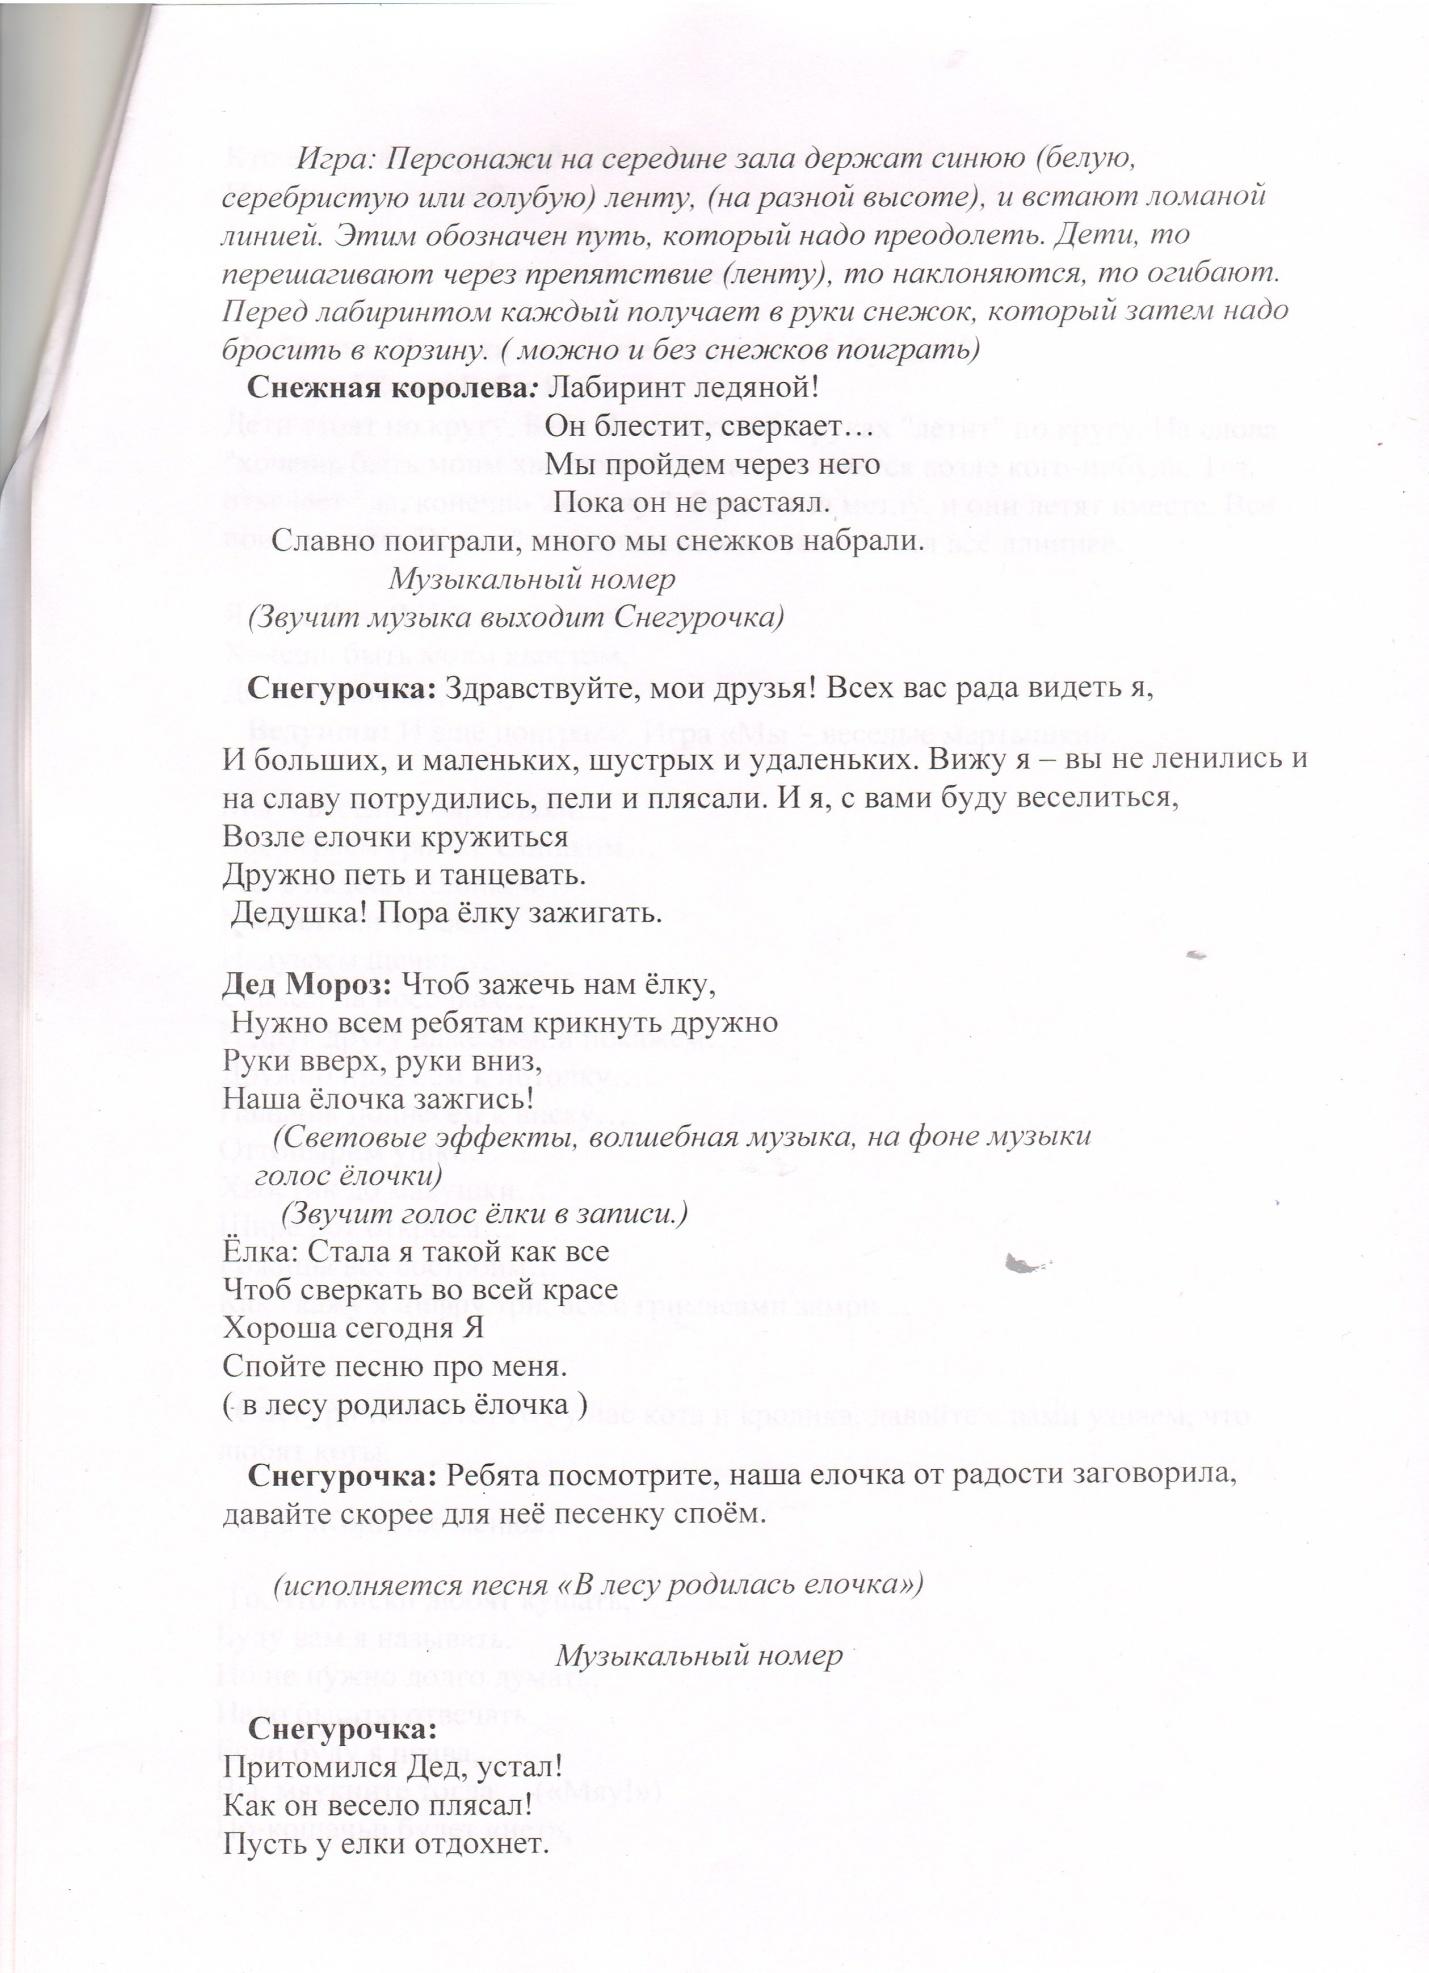 C:\Users\Sof\AppData\Roaming\Skype\My Skype Received Files\scan 6(1).jpg